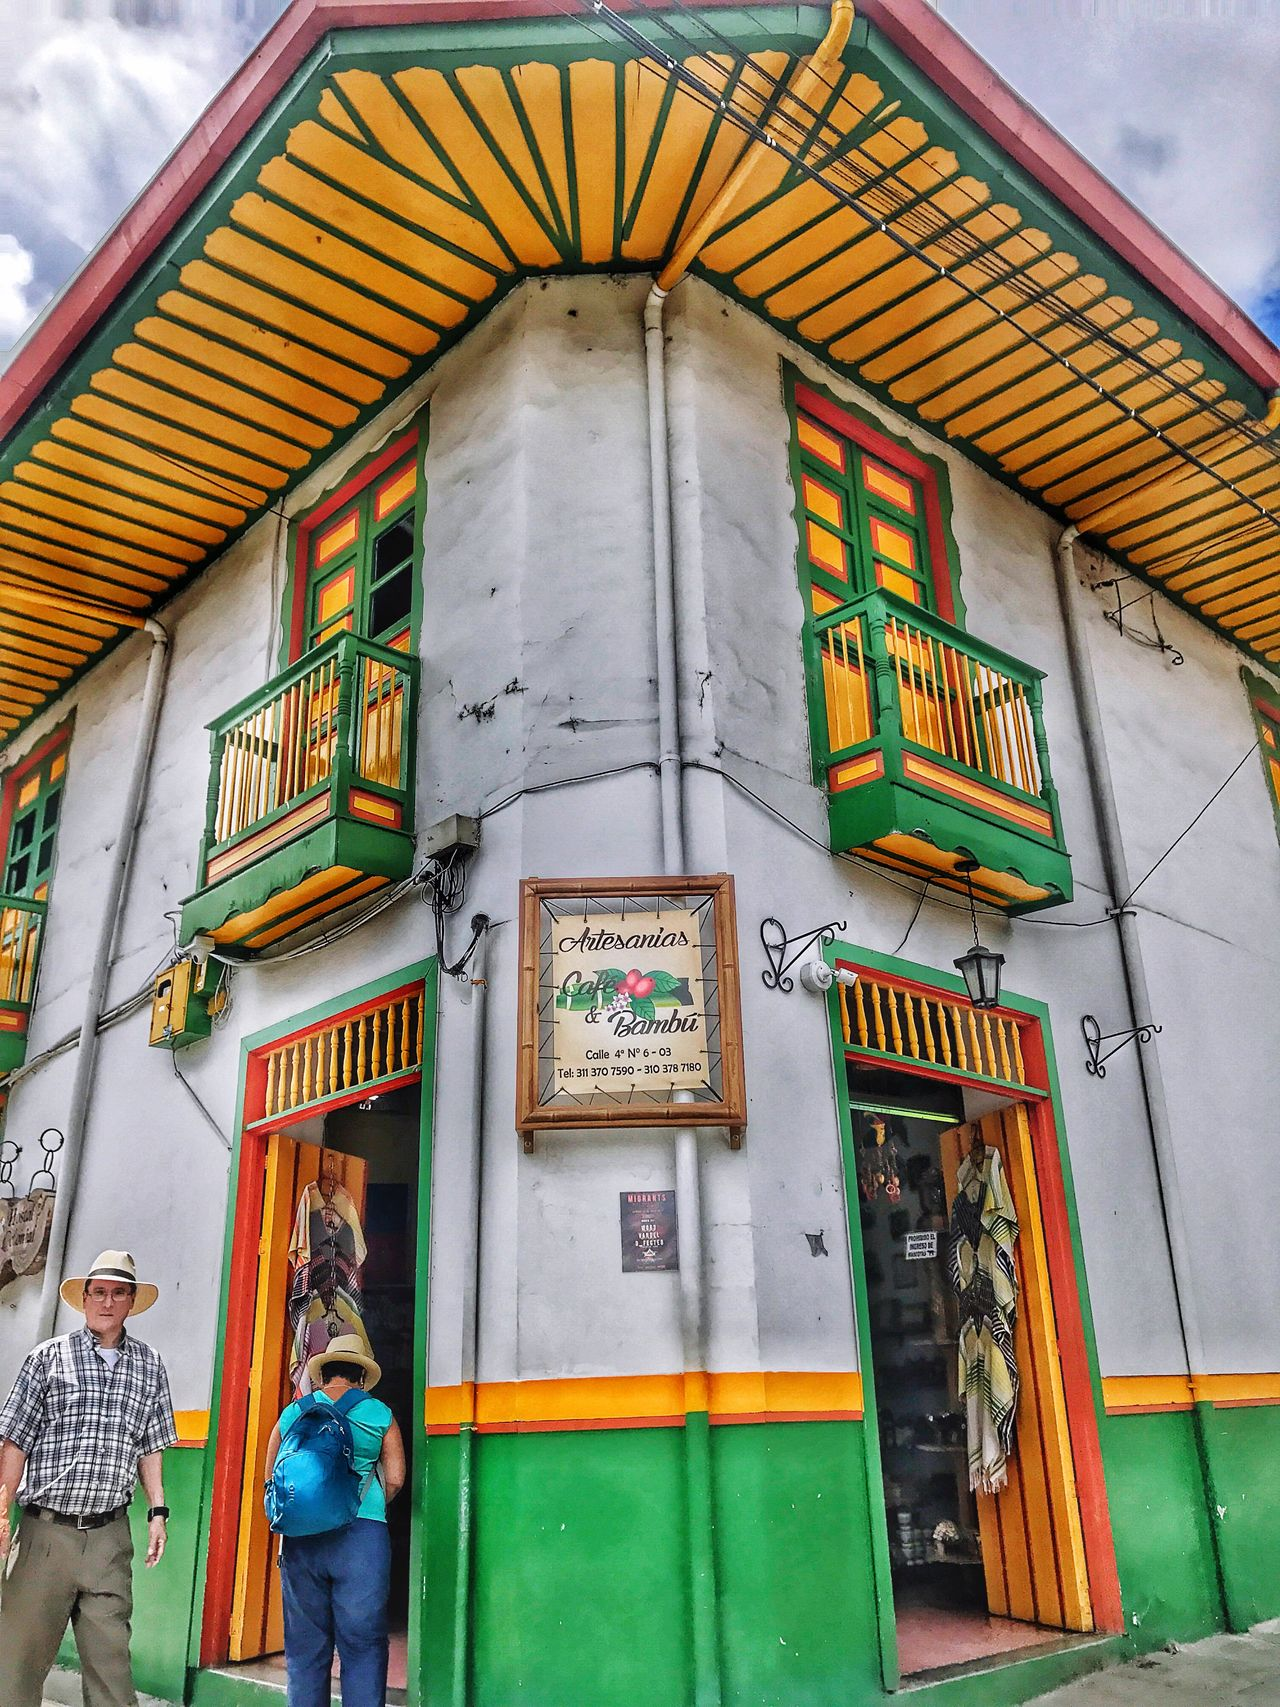 EyeEm Selects Panama old city Centra Tralamerca Panamá TravelsuRes